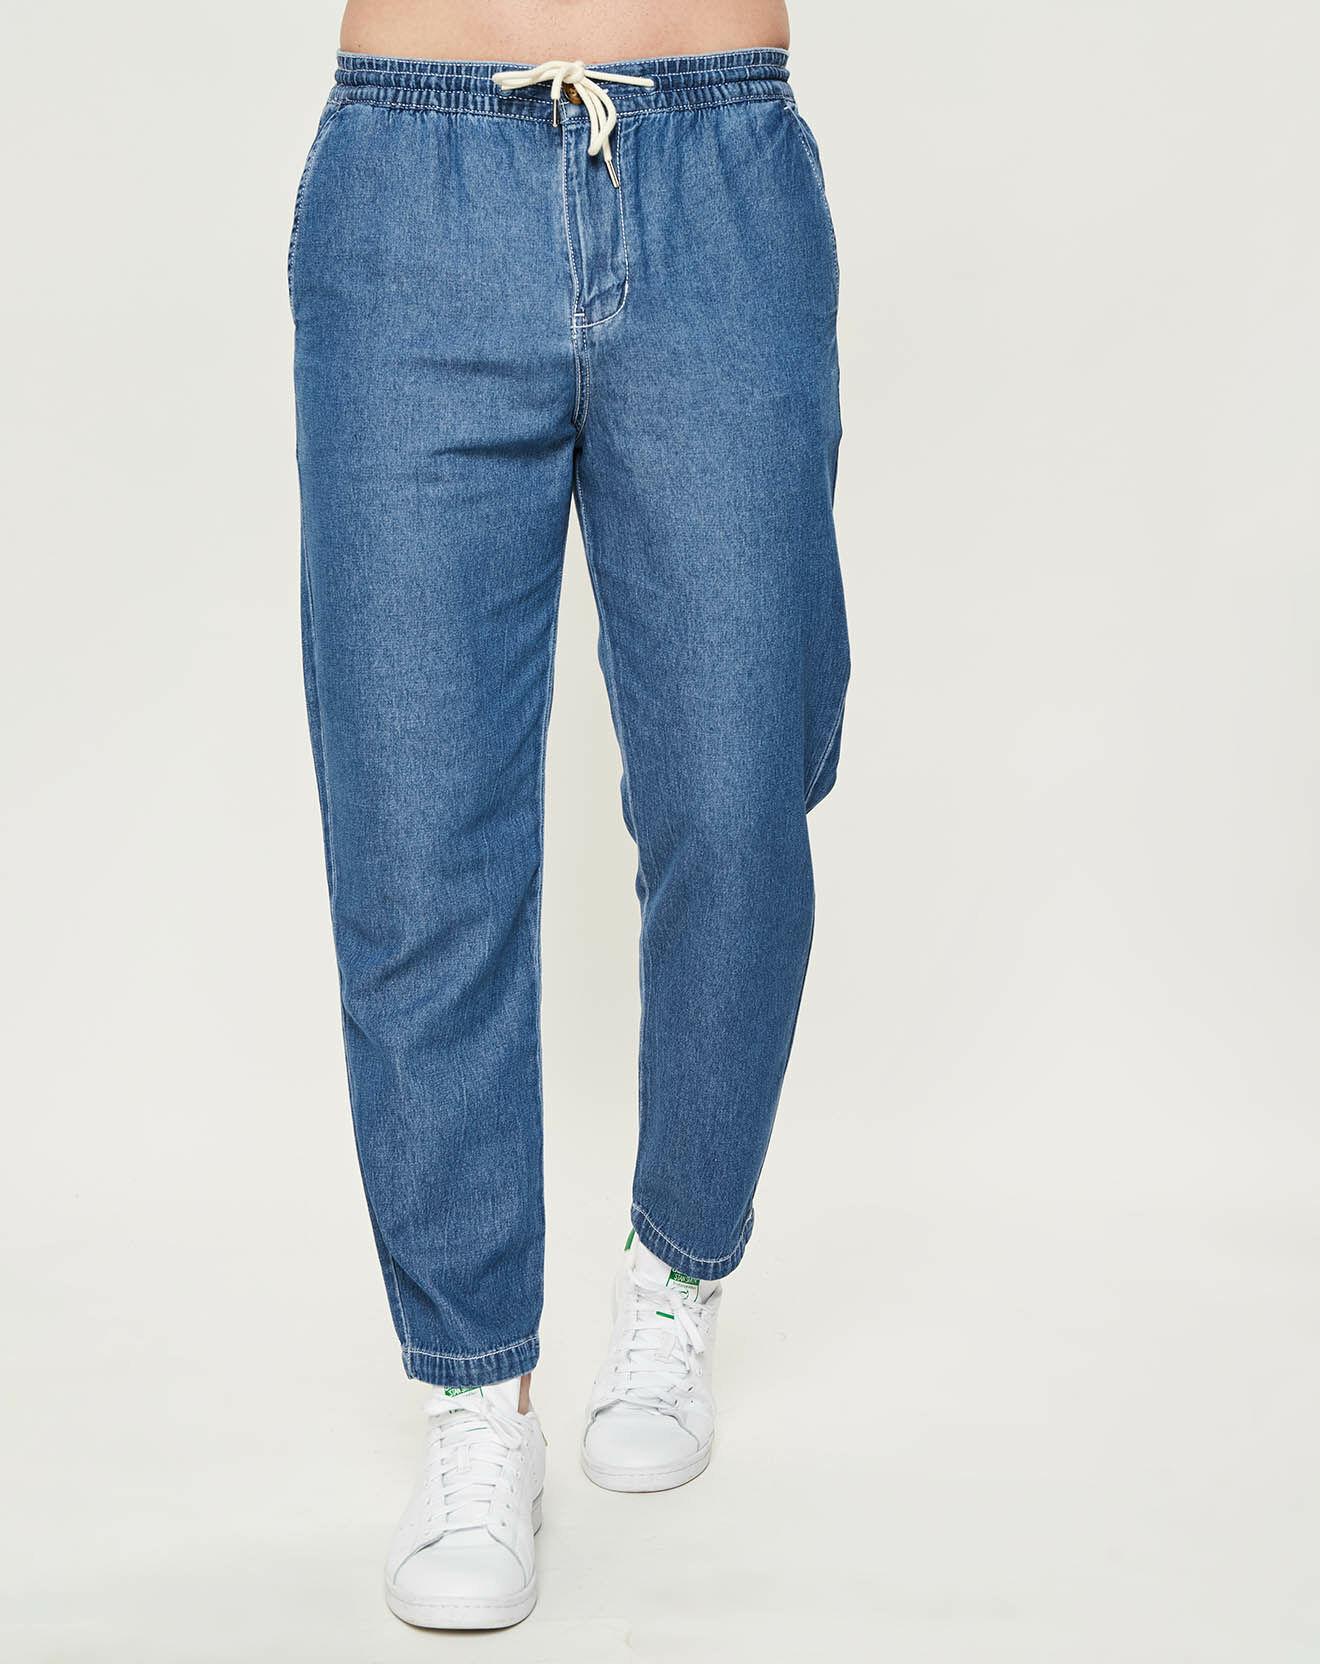 Pantalon Denim bleu - Quiksilver - Modalova